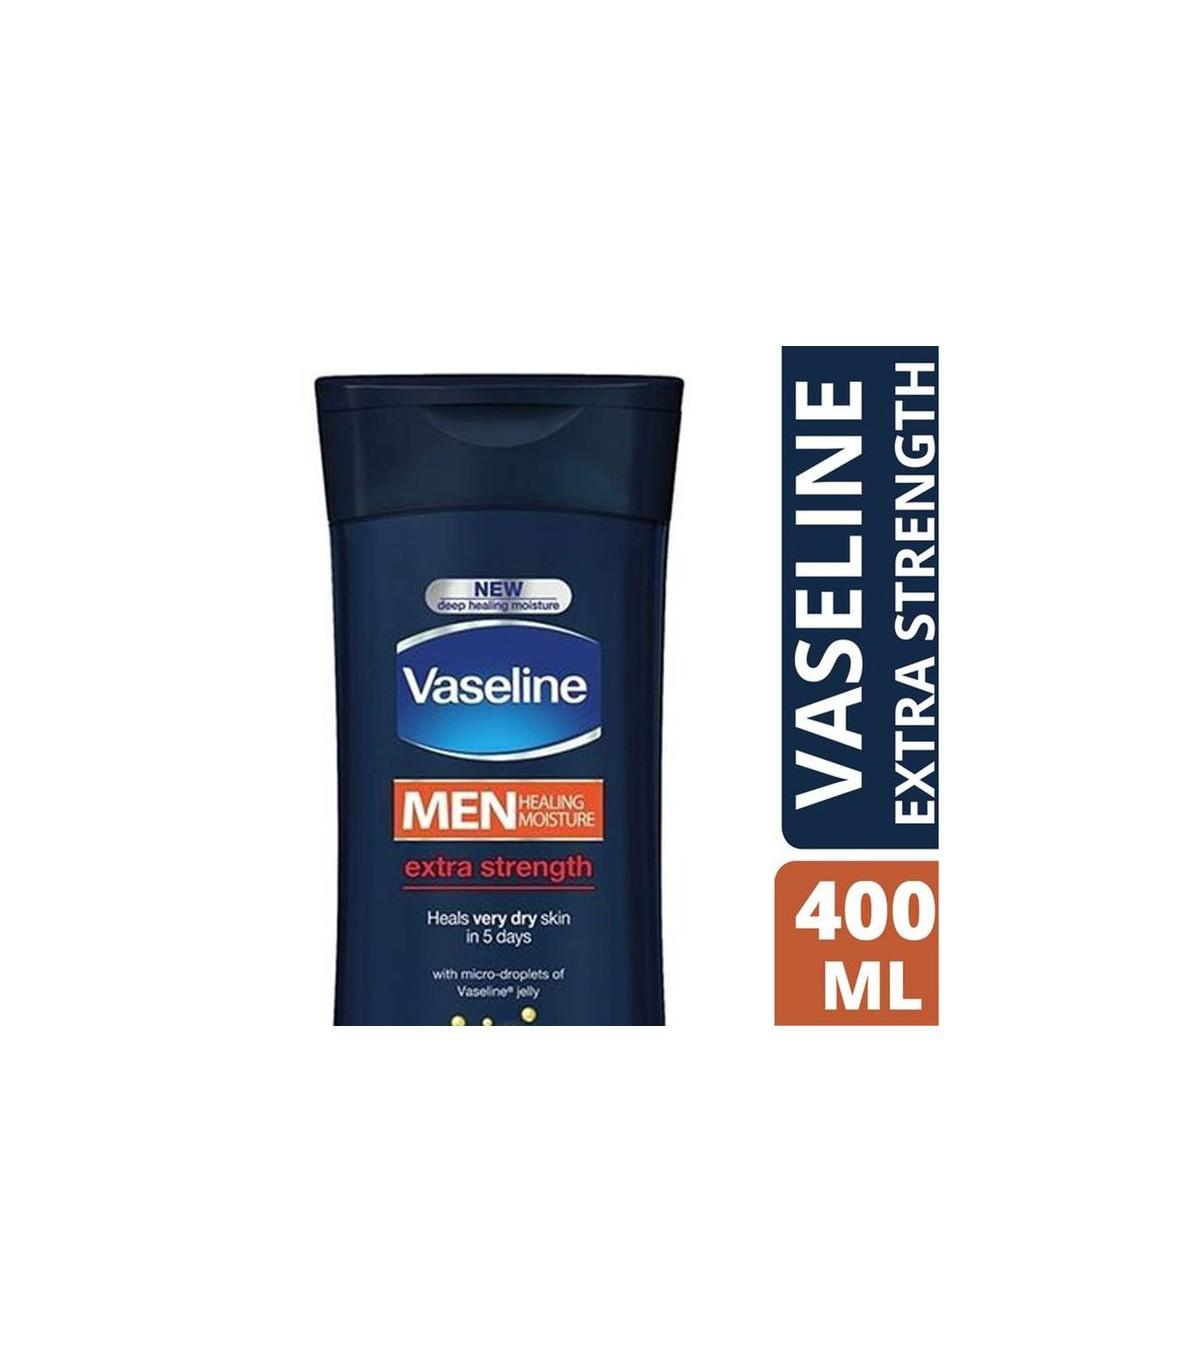 Vaseline لوسیون بدن مردانه فوق قوی 400 میل وازلین